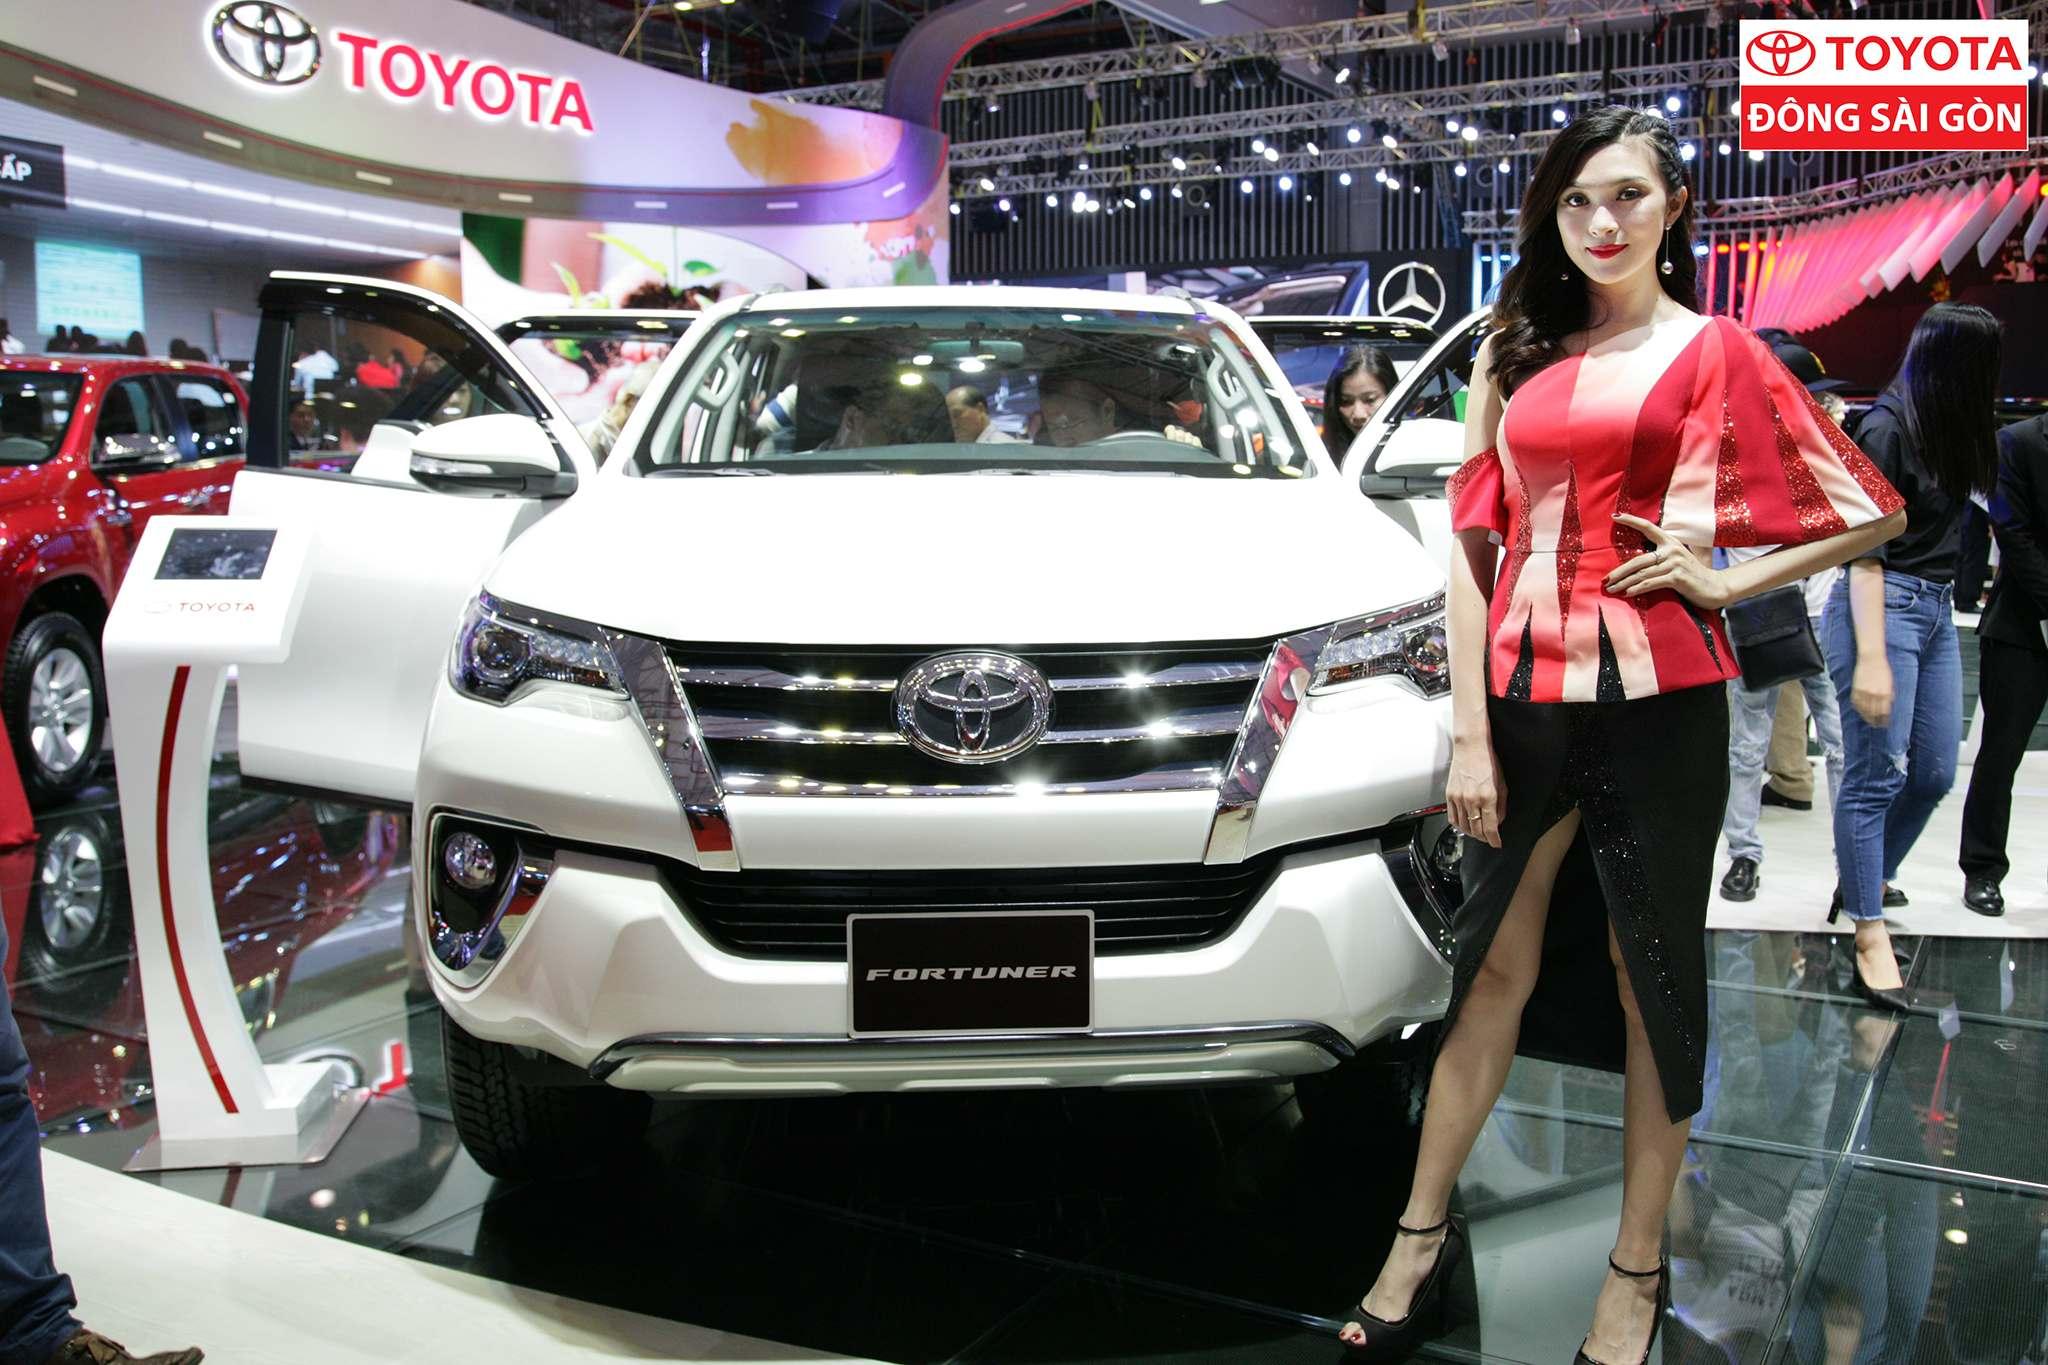 vietnam motor show 20174 Toyota at Vietnam Motor Show 2017